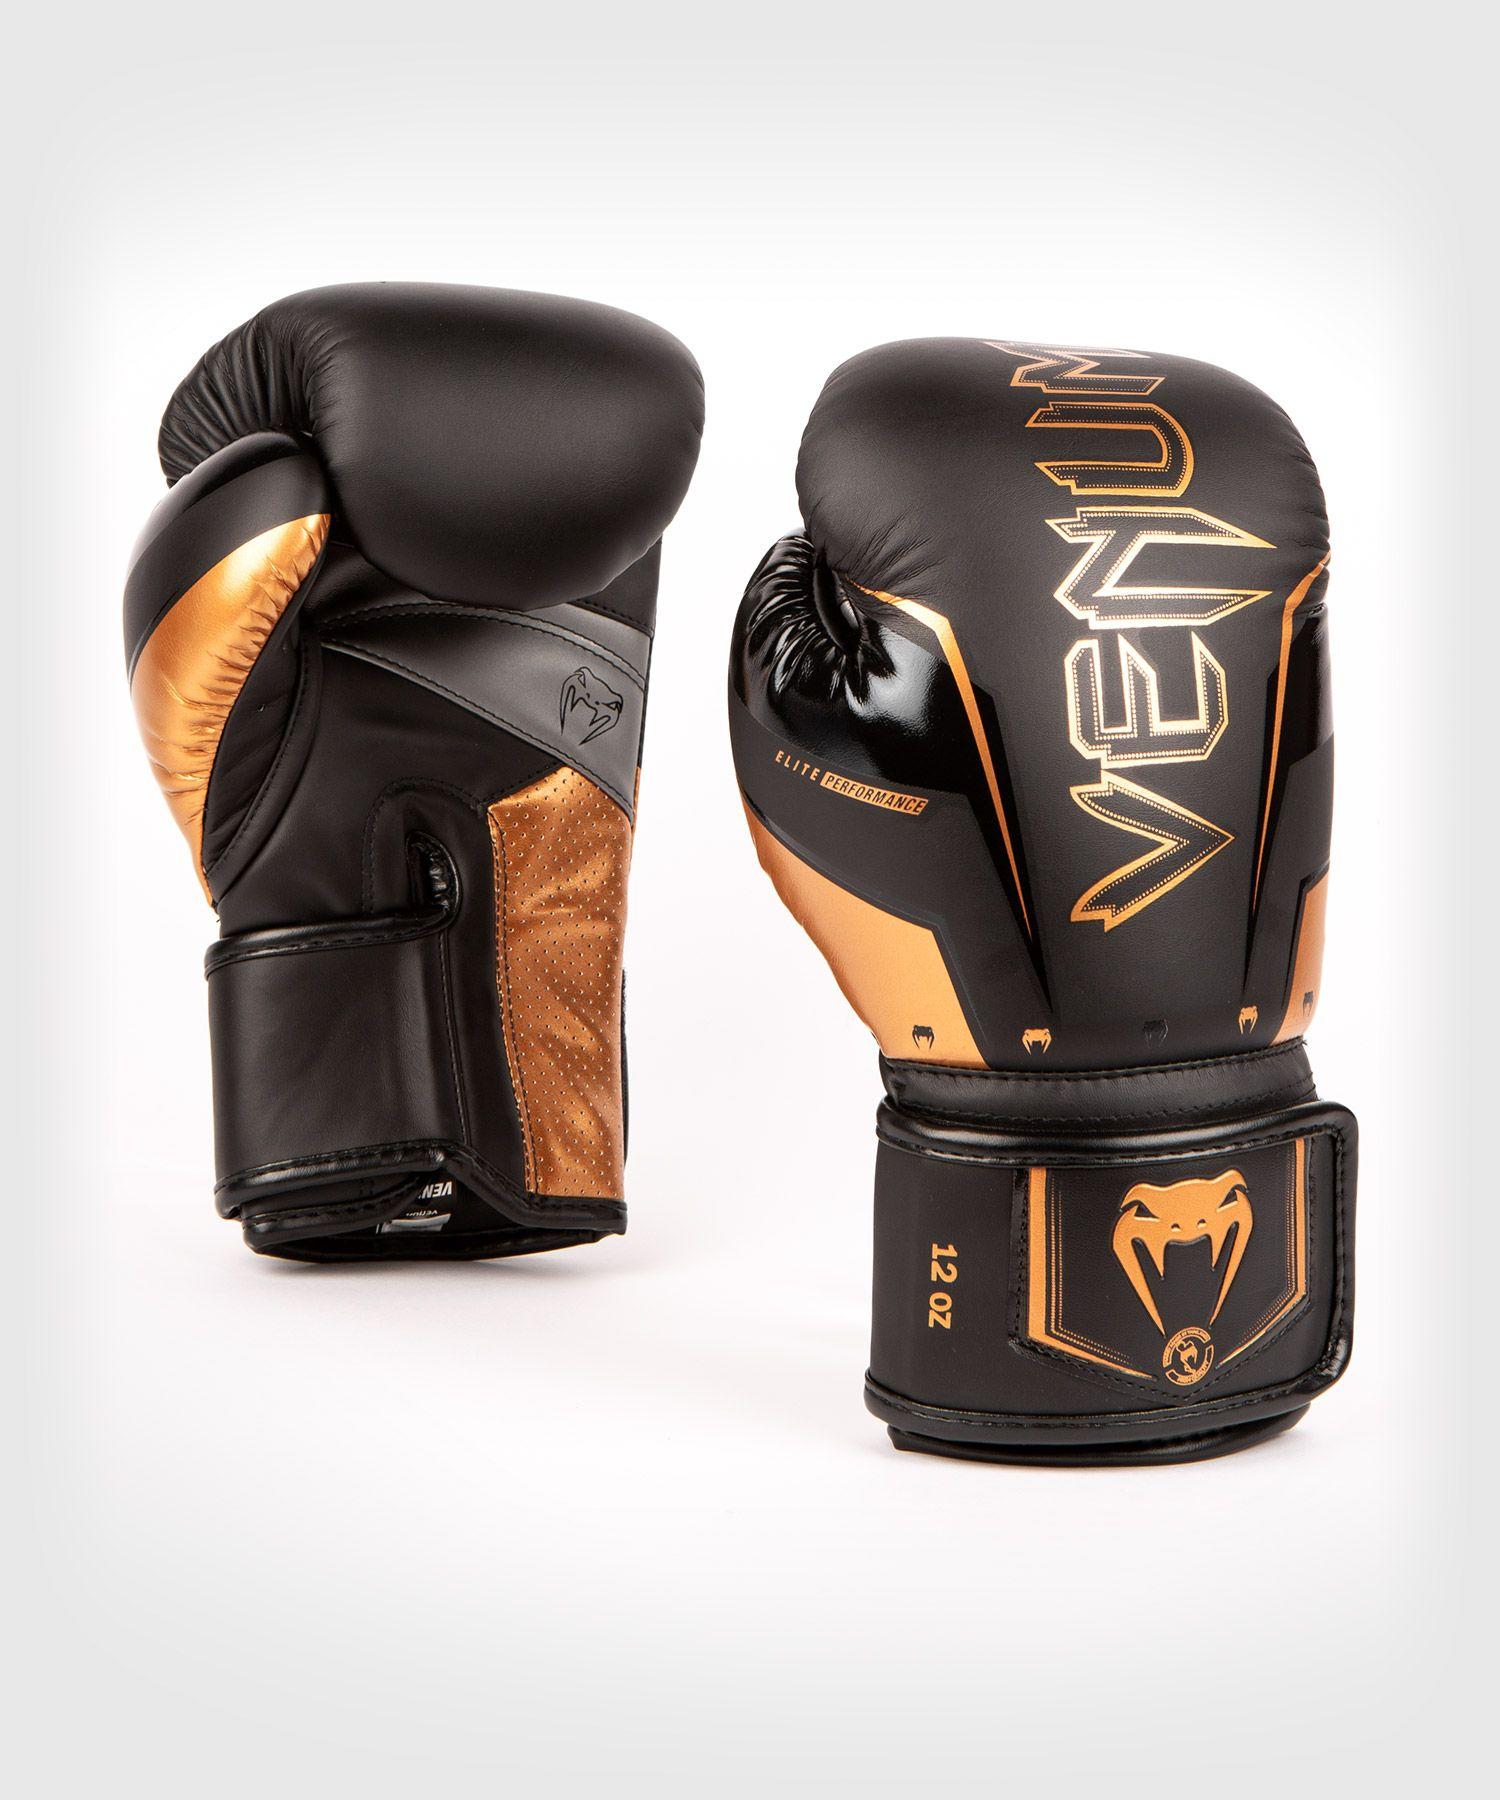 Venum Elite Evo Boxing Gloves - Black/Bronze